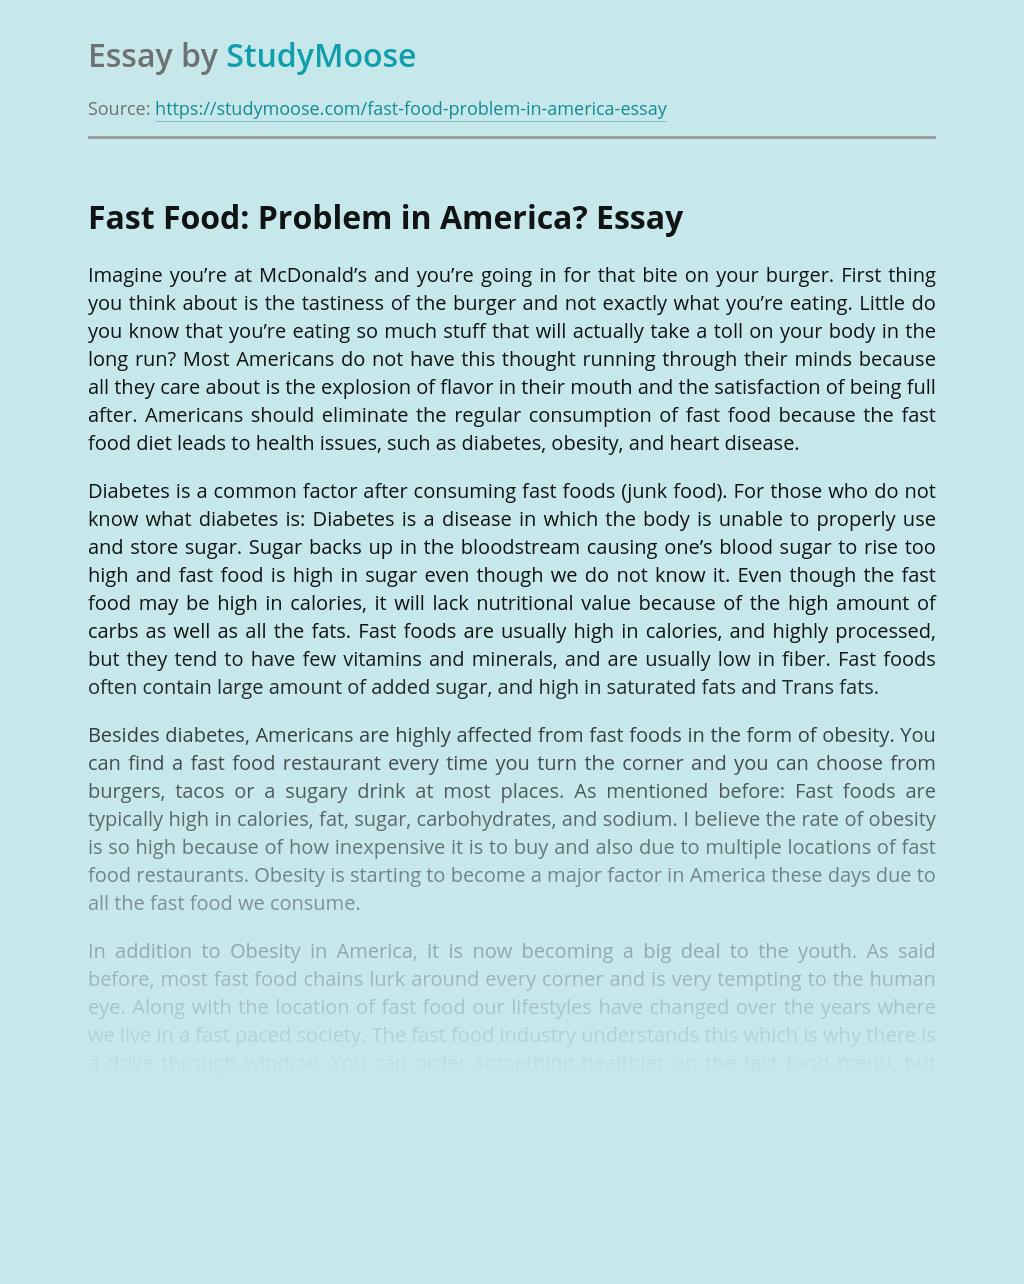 Fast Food: Problem in America?